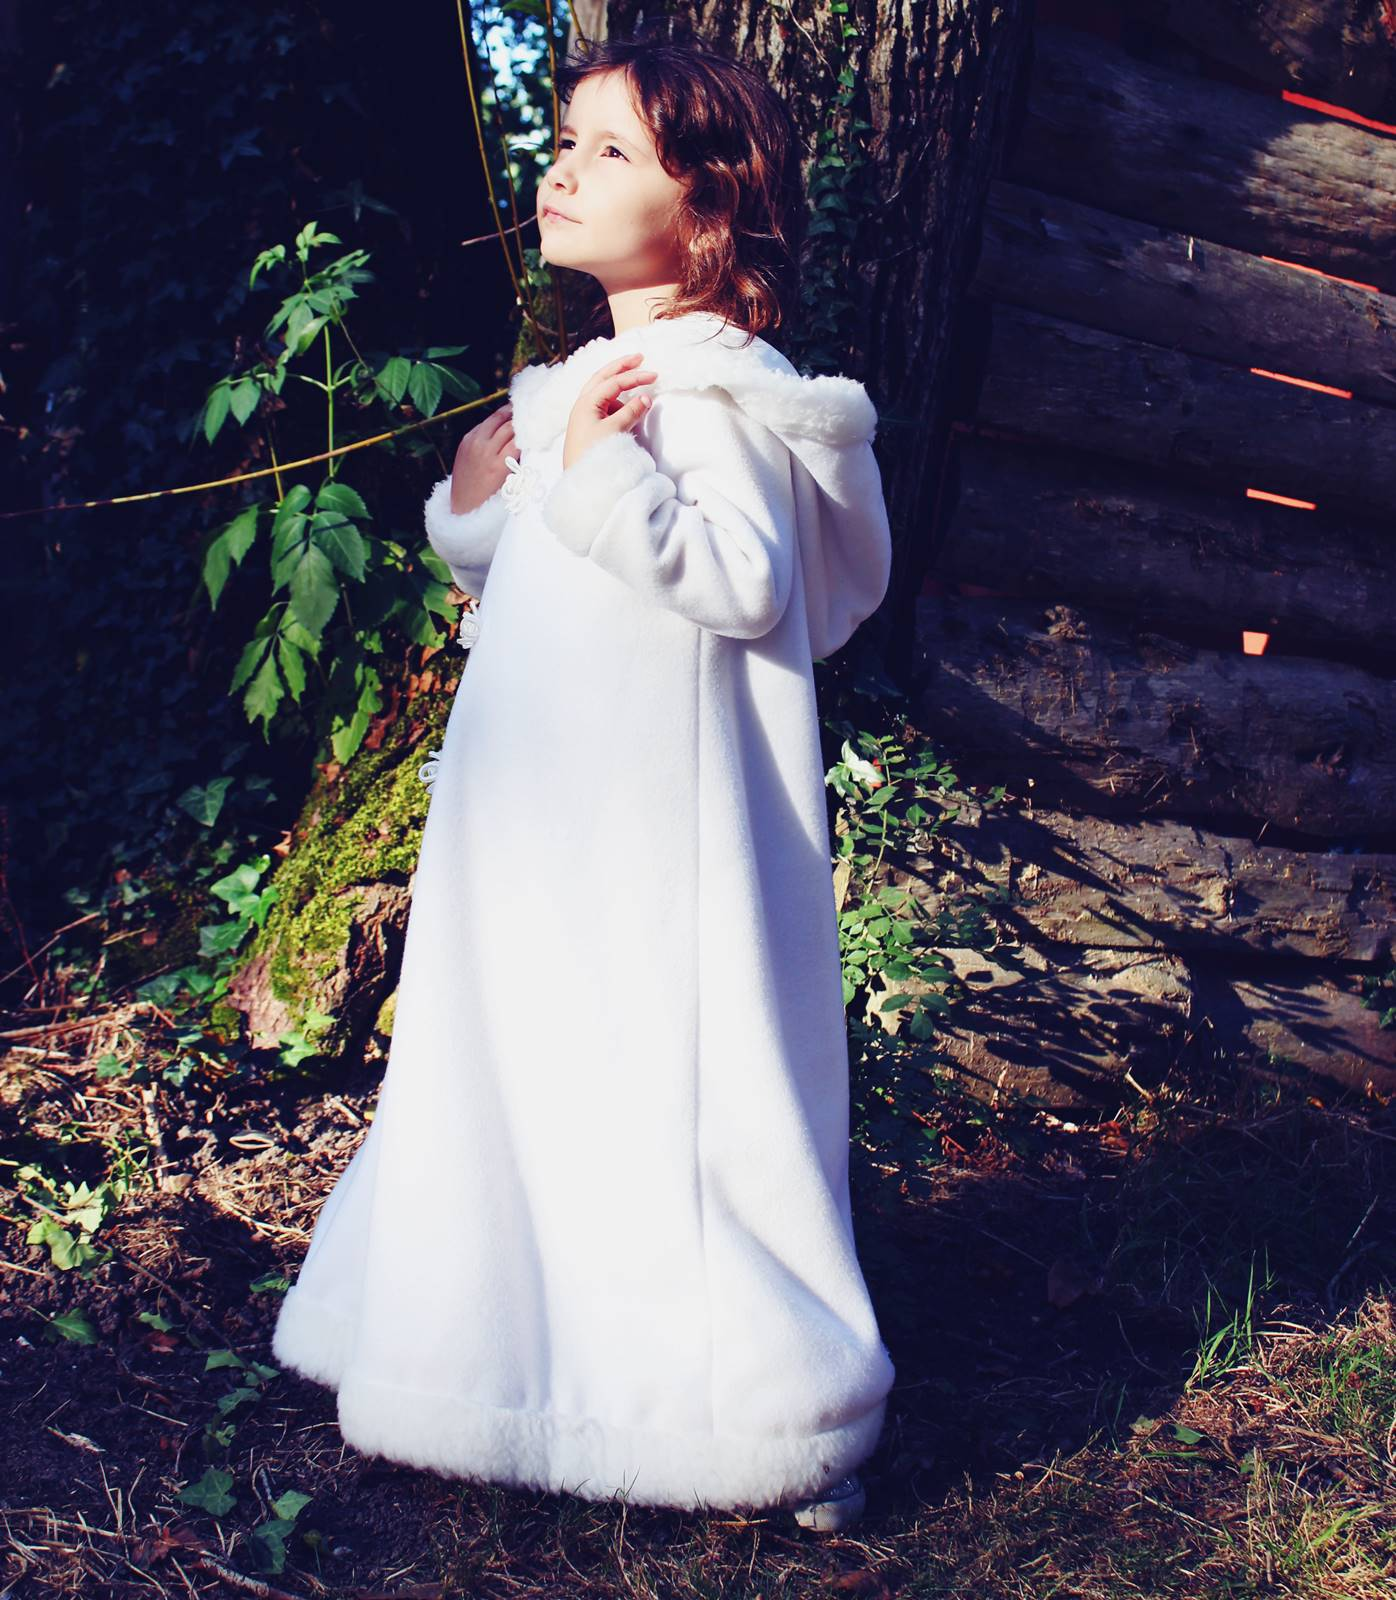 Manteau enfant made in france zero dechet 2